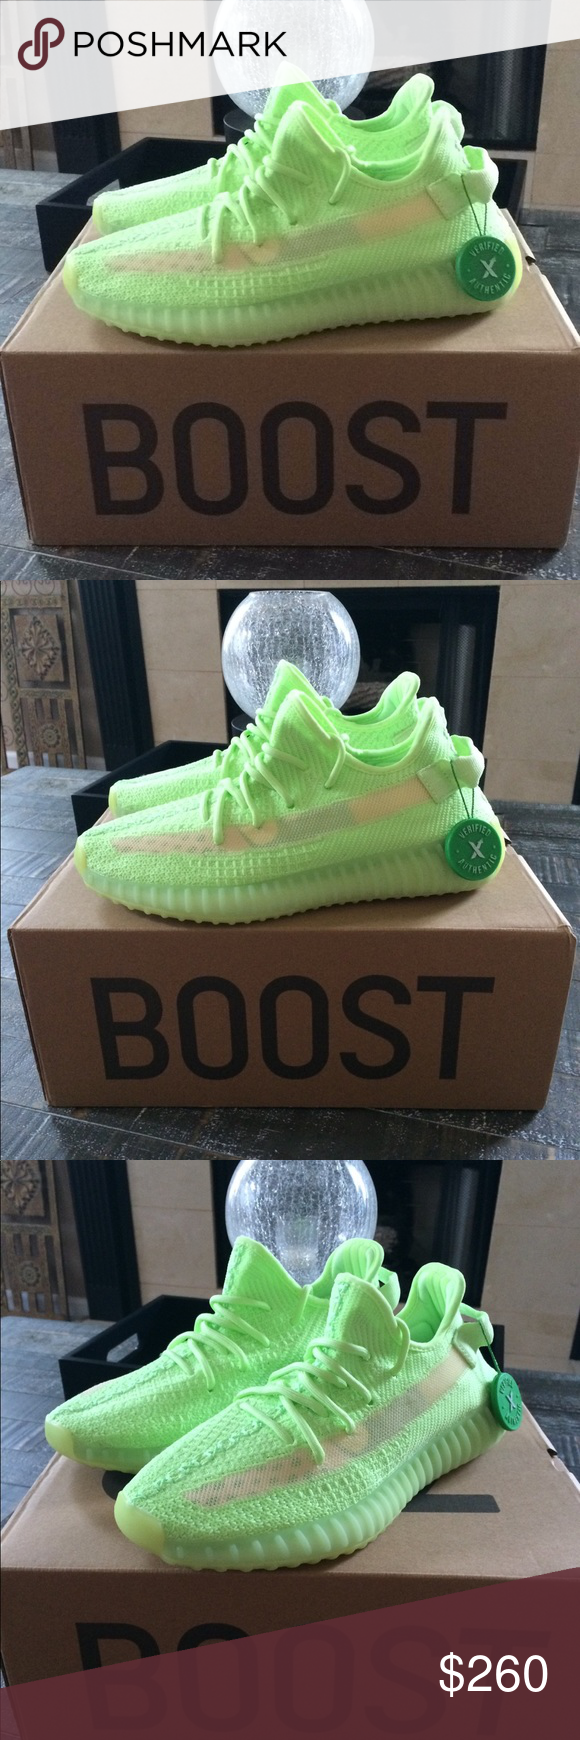 Men's Adidas Yeezy Boost 350 V2 Glow Size 7 NEW Brand new